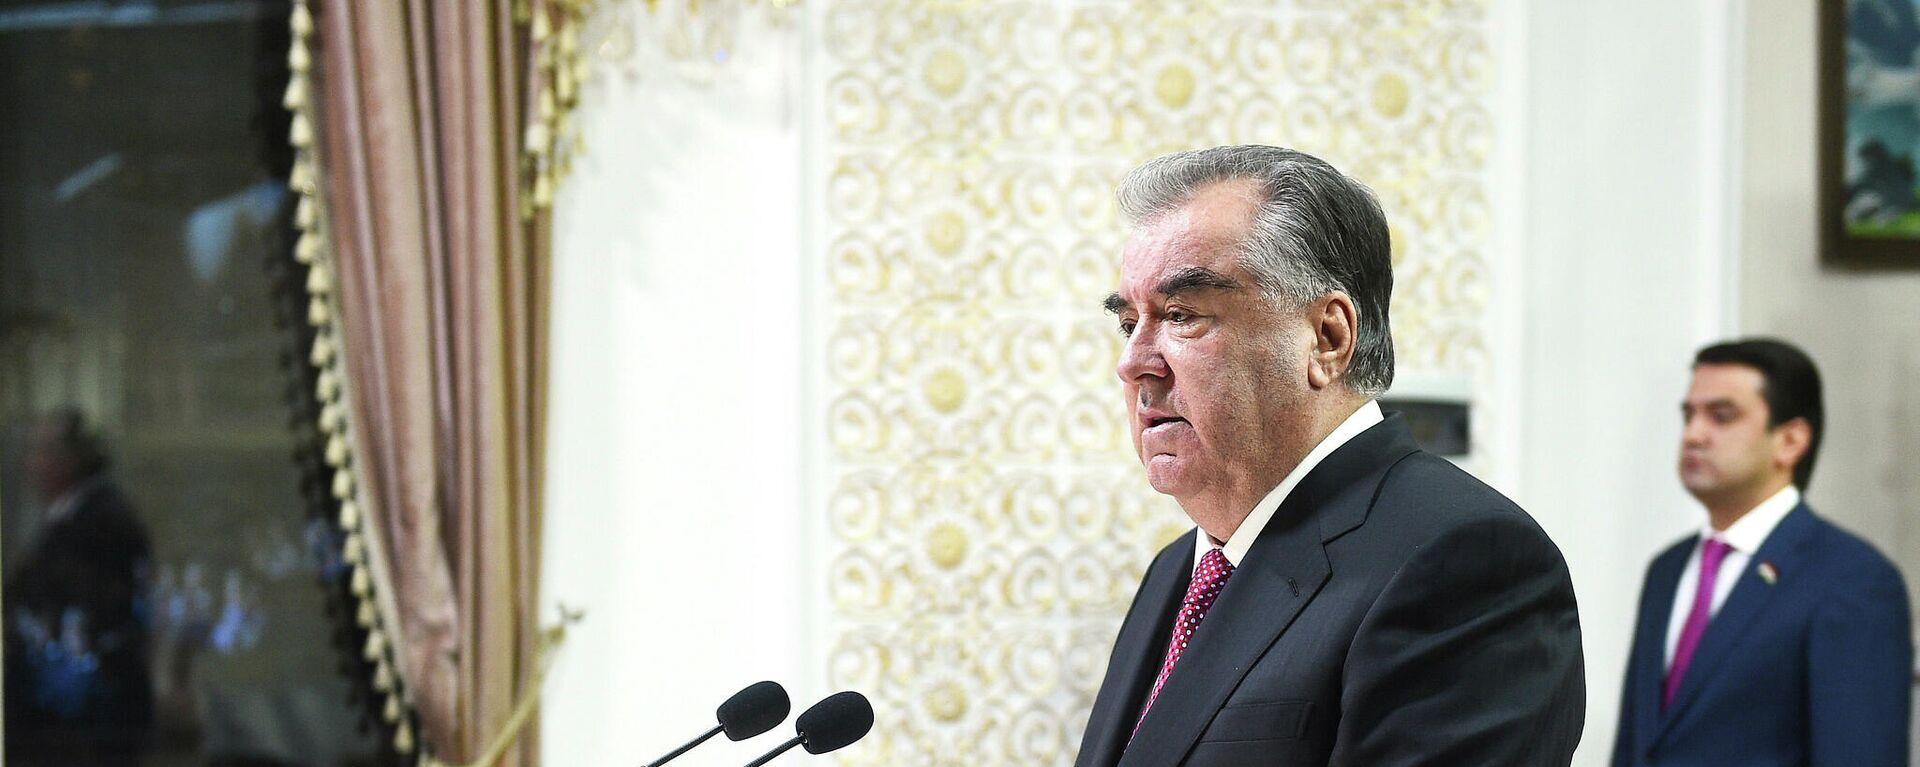 Президент Республики Таджикистан Эмомали Рахмон - Sputnik Тоҷикистон, 1920, 16.09.2021